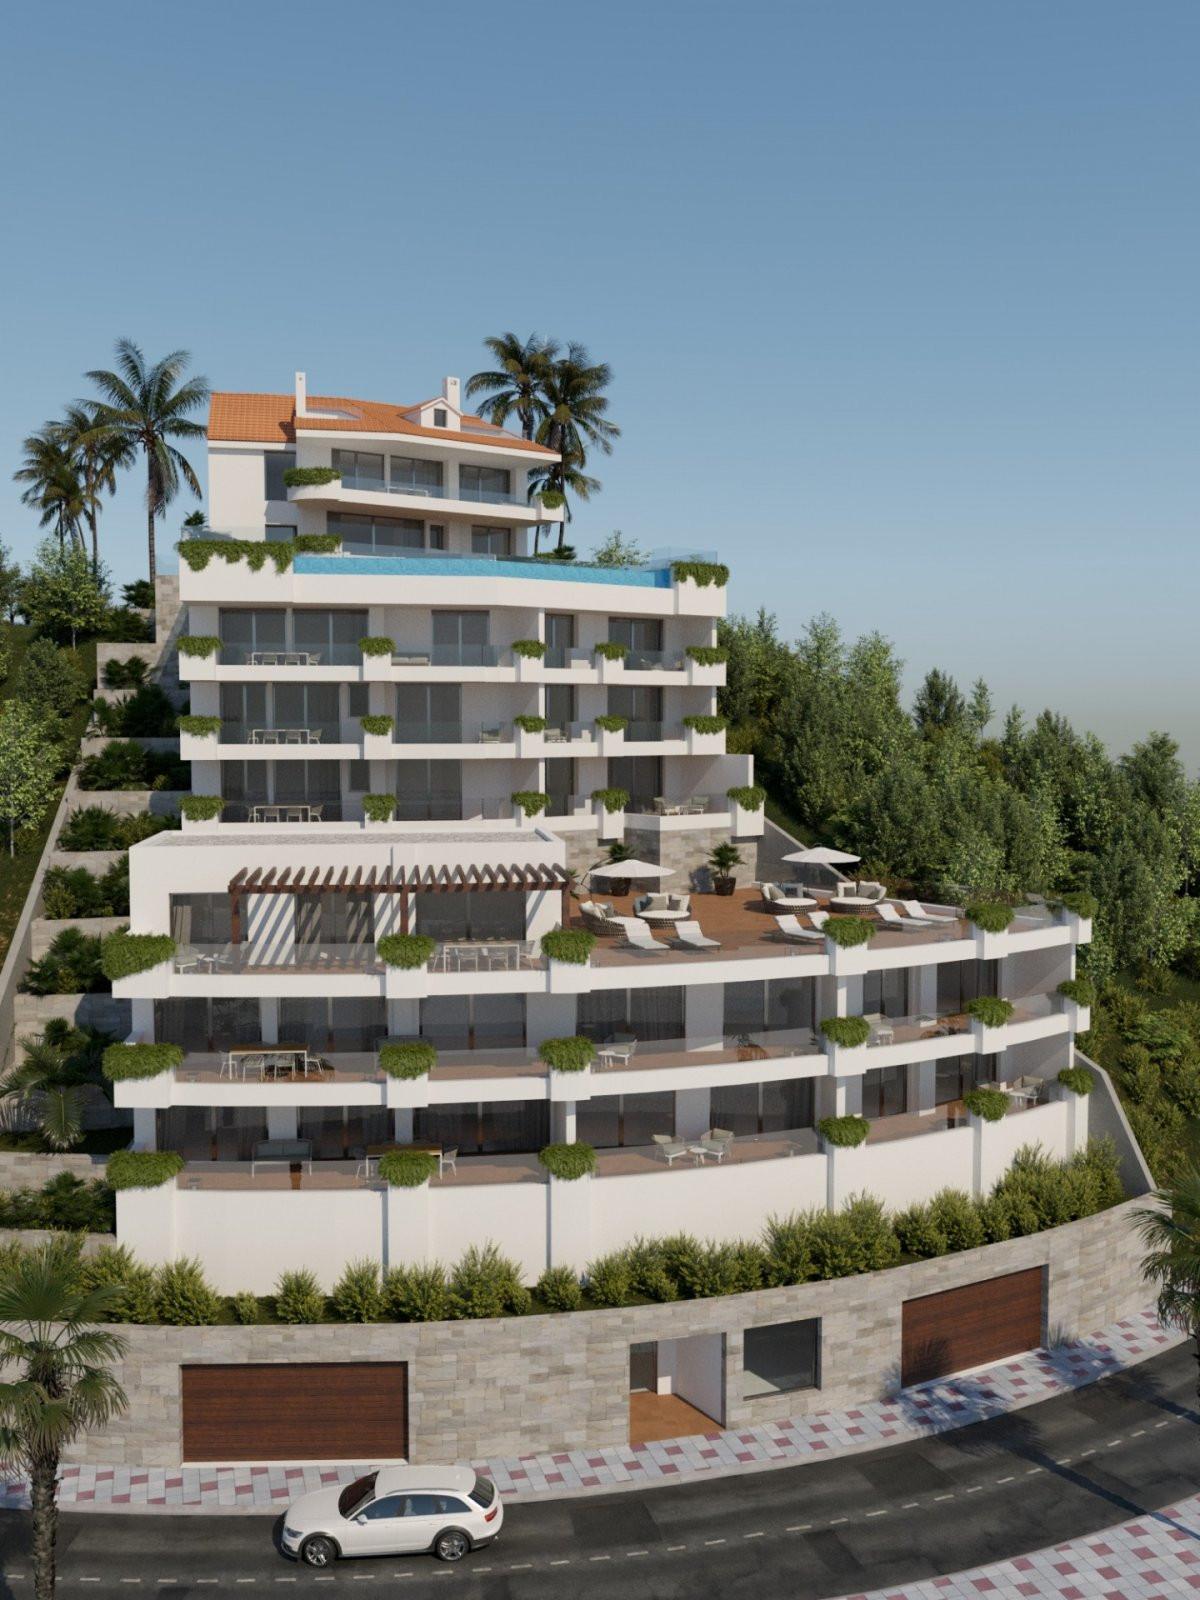 Off plan complex of modern apartments for sale in Nueva Torrequebrada – Benalmádena